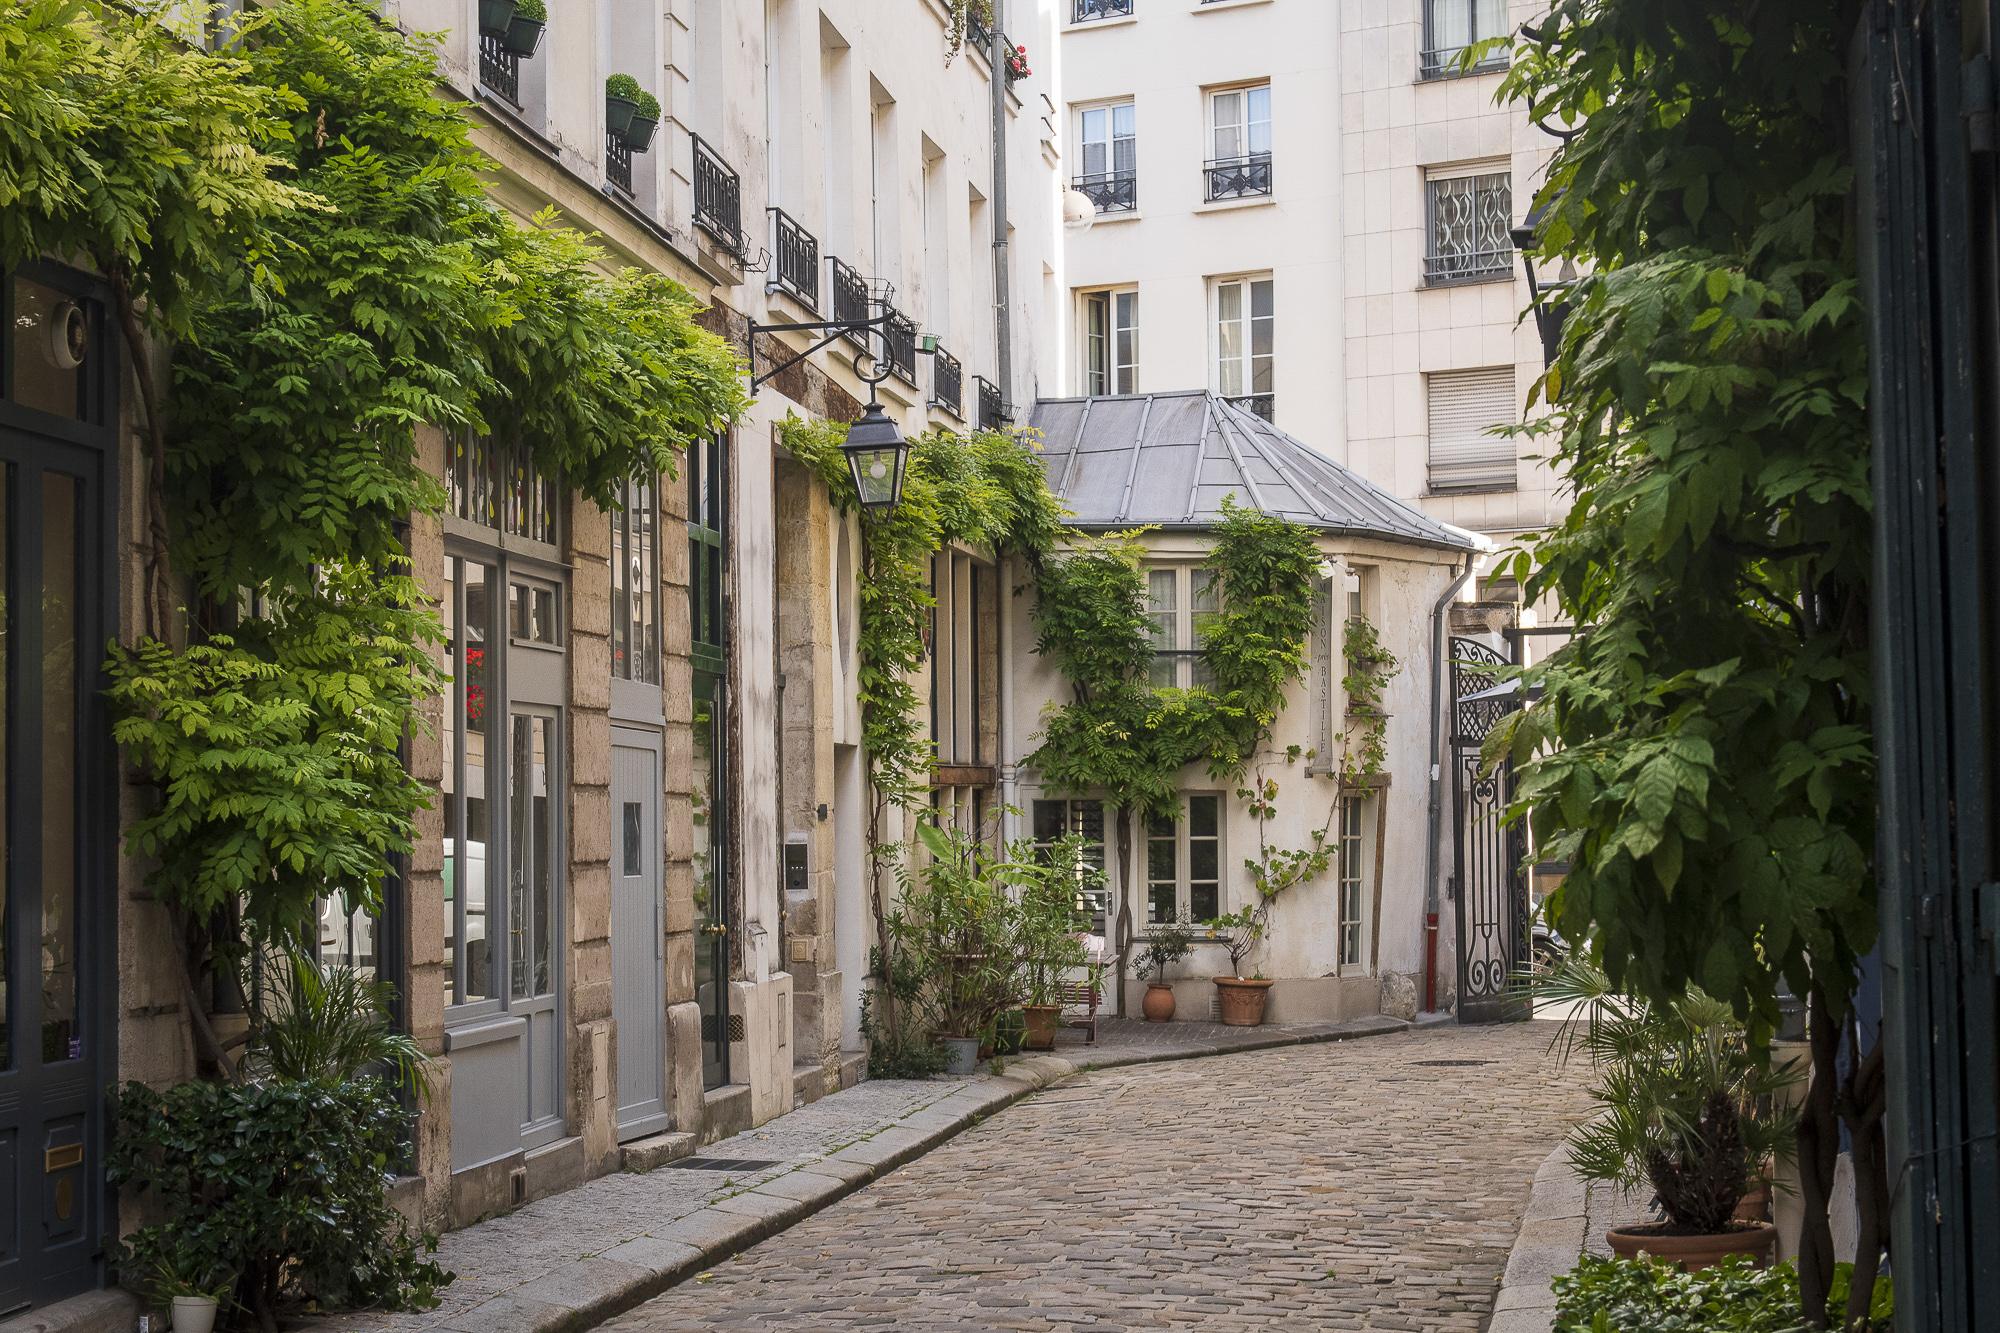 paris-photo-tour-015.jpg